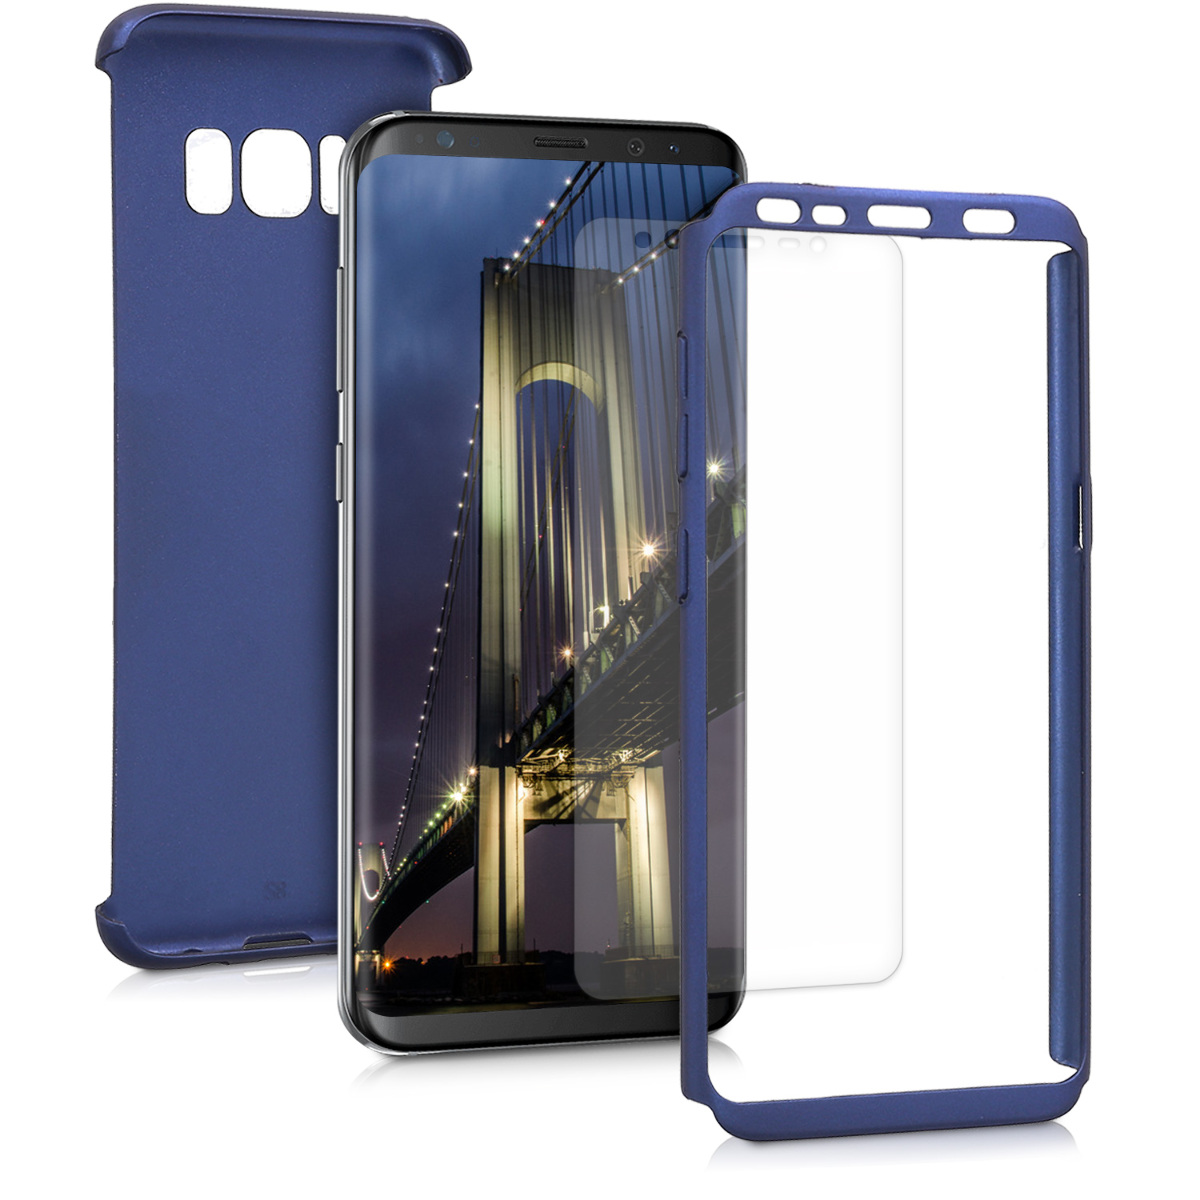 KW Θήκη Full Body Samsung Galaxy S8 & Screen Protector - Μπλε μεταλλικό (43781.64)